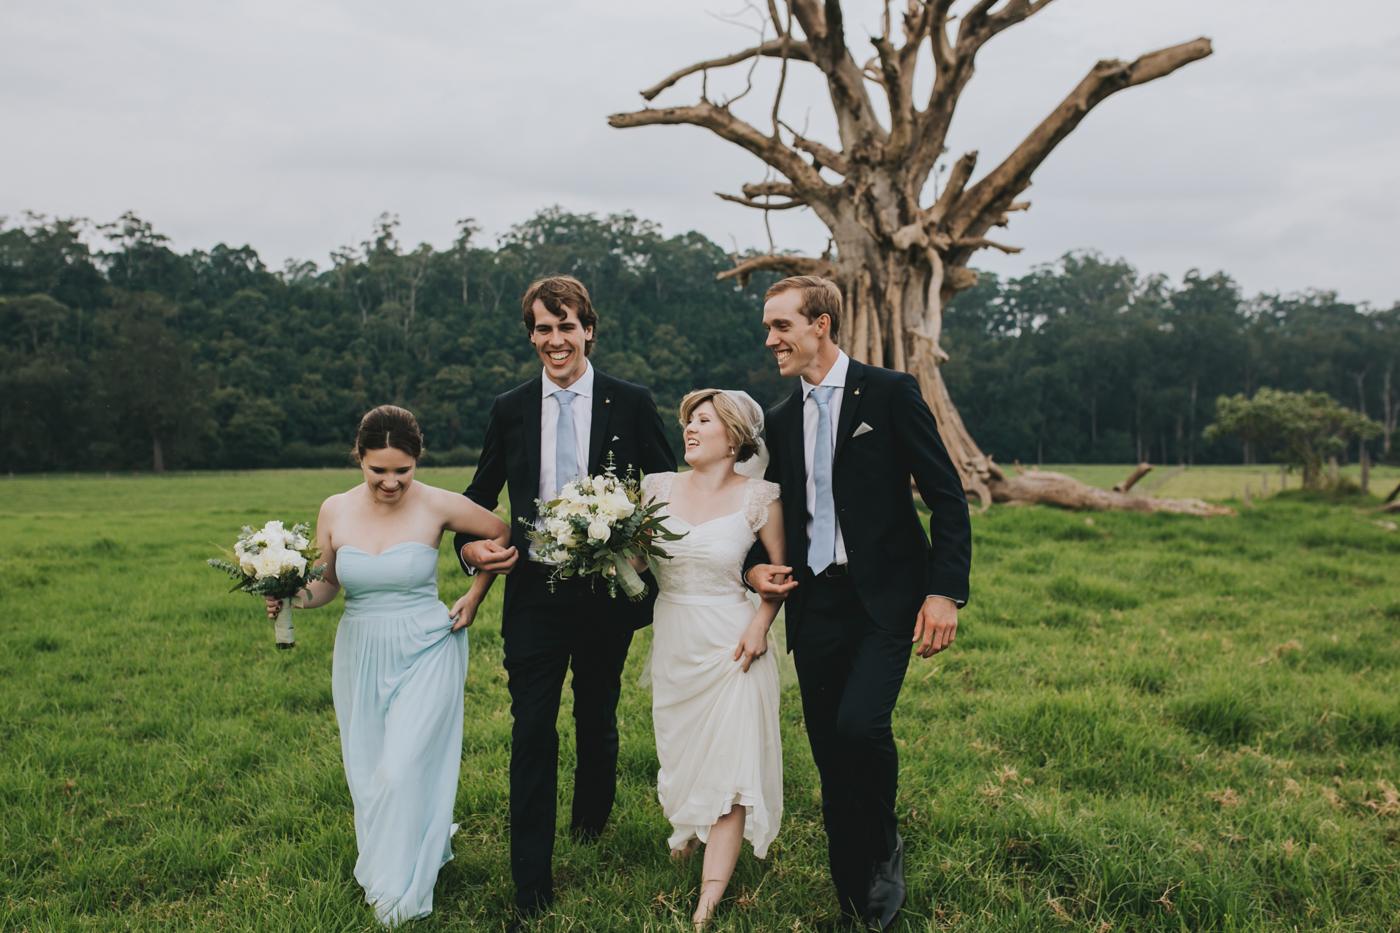 Rachel & Jacob - Willow Farm Berry - South Coast Wedding - Samantha Heather Photography-105.jpg